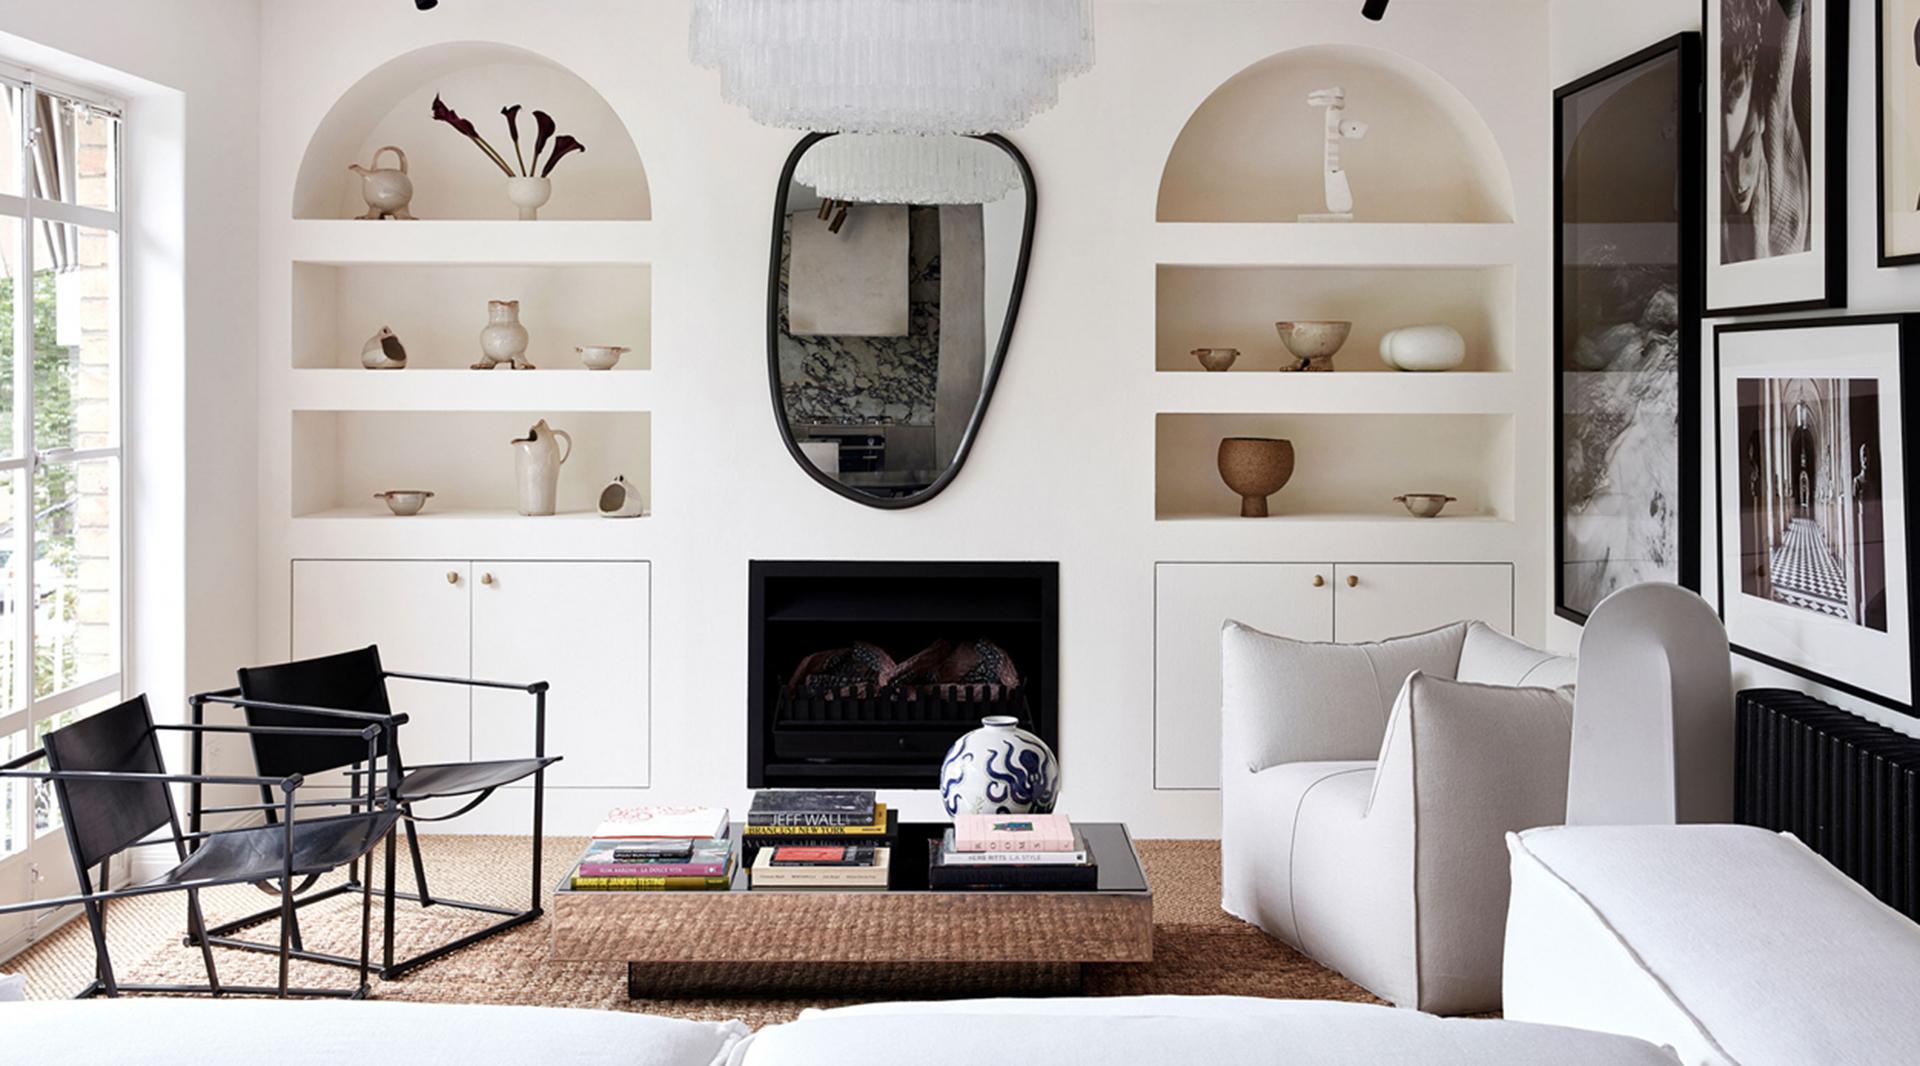 Квартира с минималистичным декором по проекту Тэмсин Джонсон